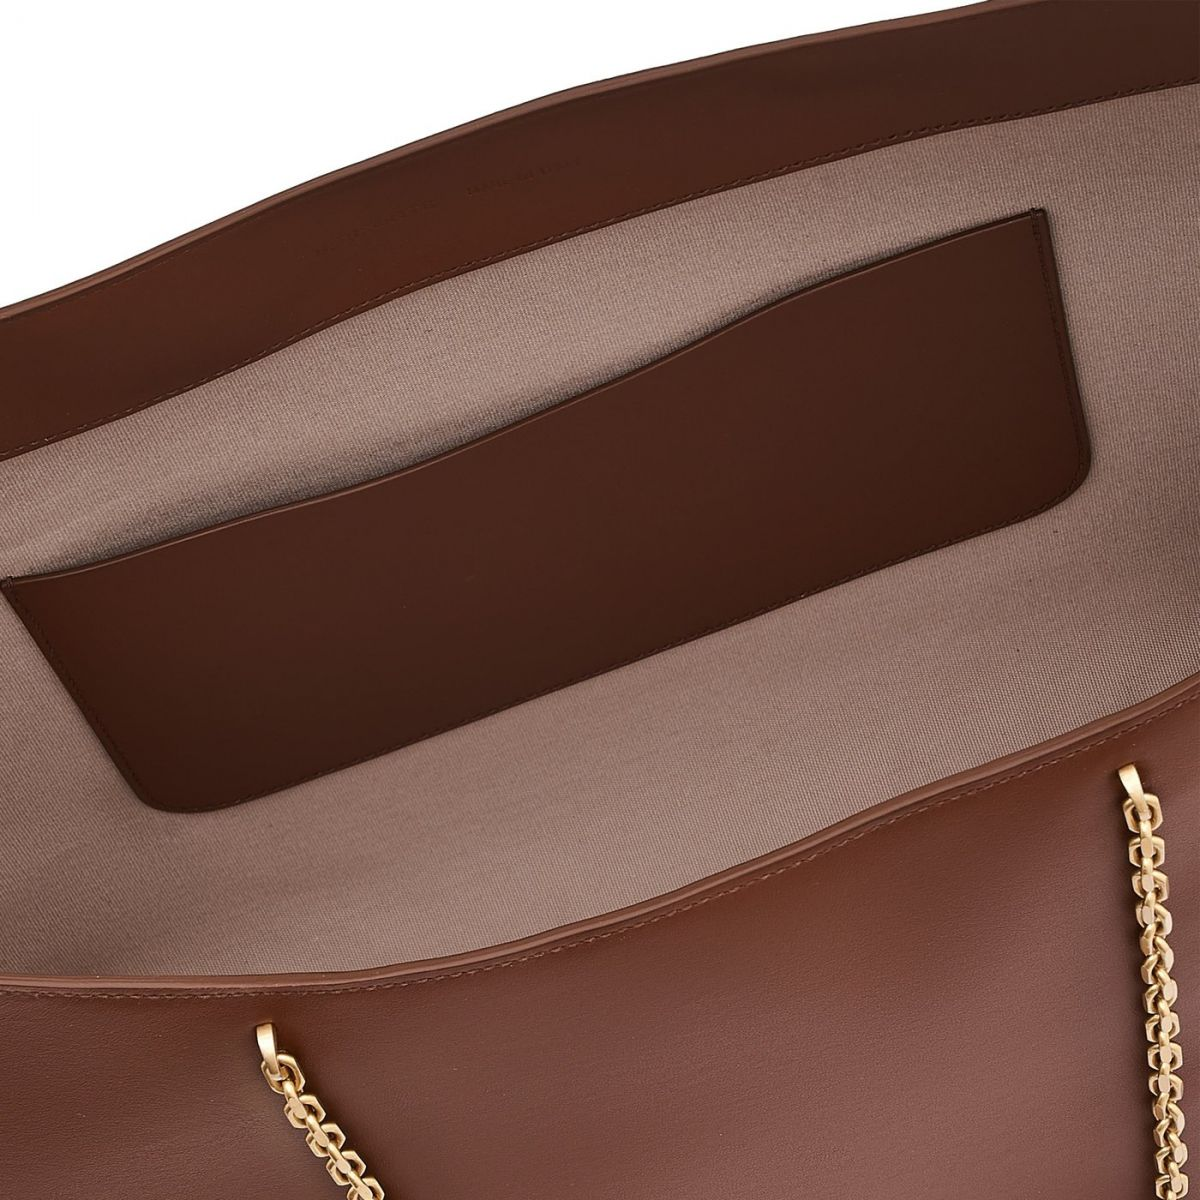 Elba - Women's Tote Bag in Calf Leather color Tobacco - Mediterranea line BTO096 | Details